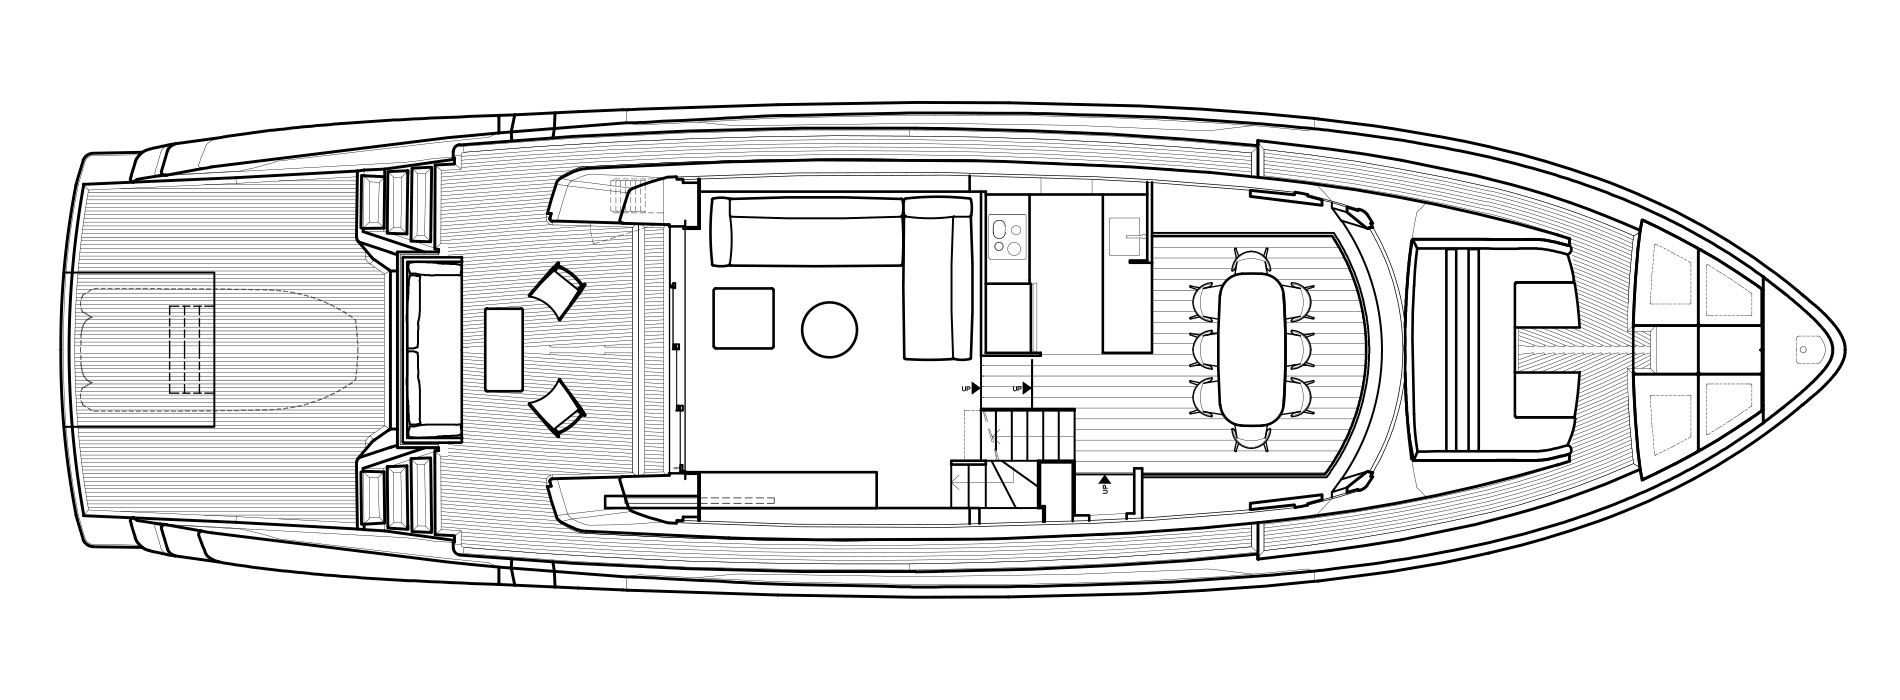 Sanlorenzo Yachts SX76 Hauptdeck Versione B